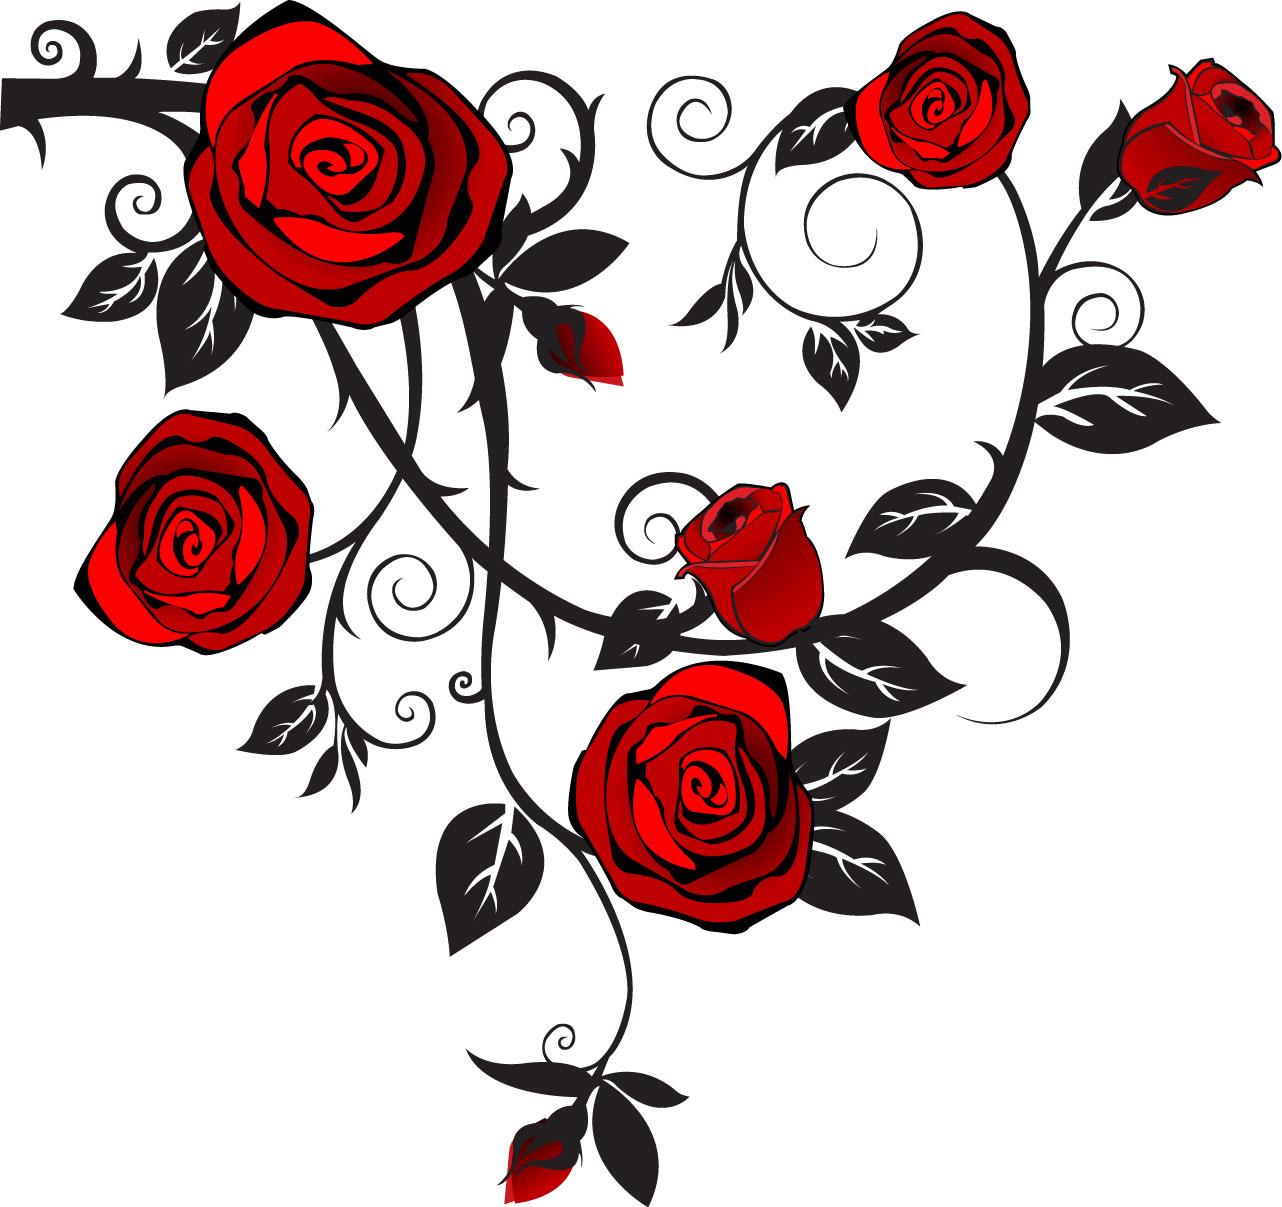 1282x1207 Rose Free Images